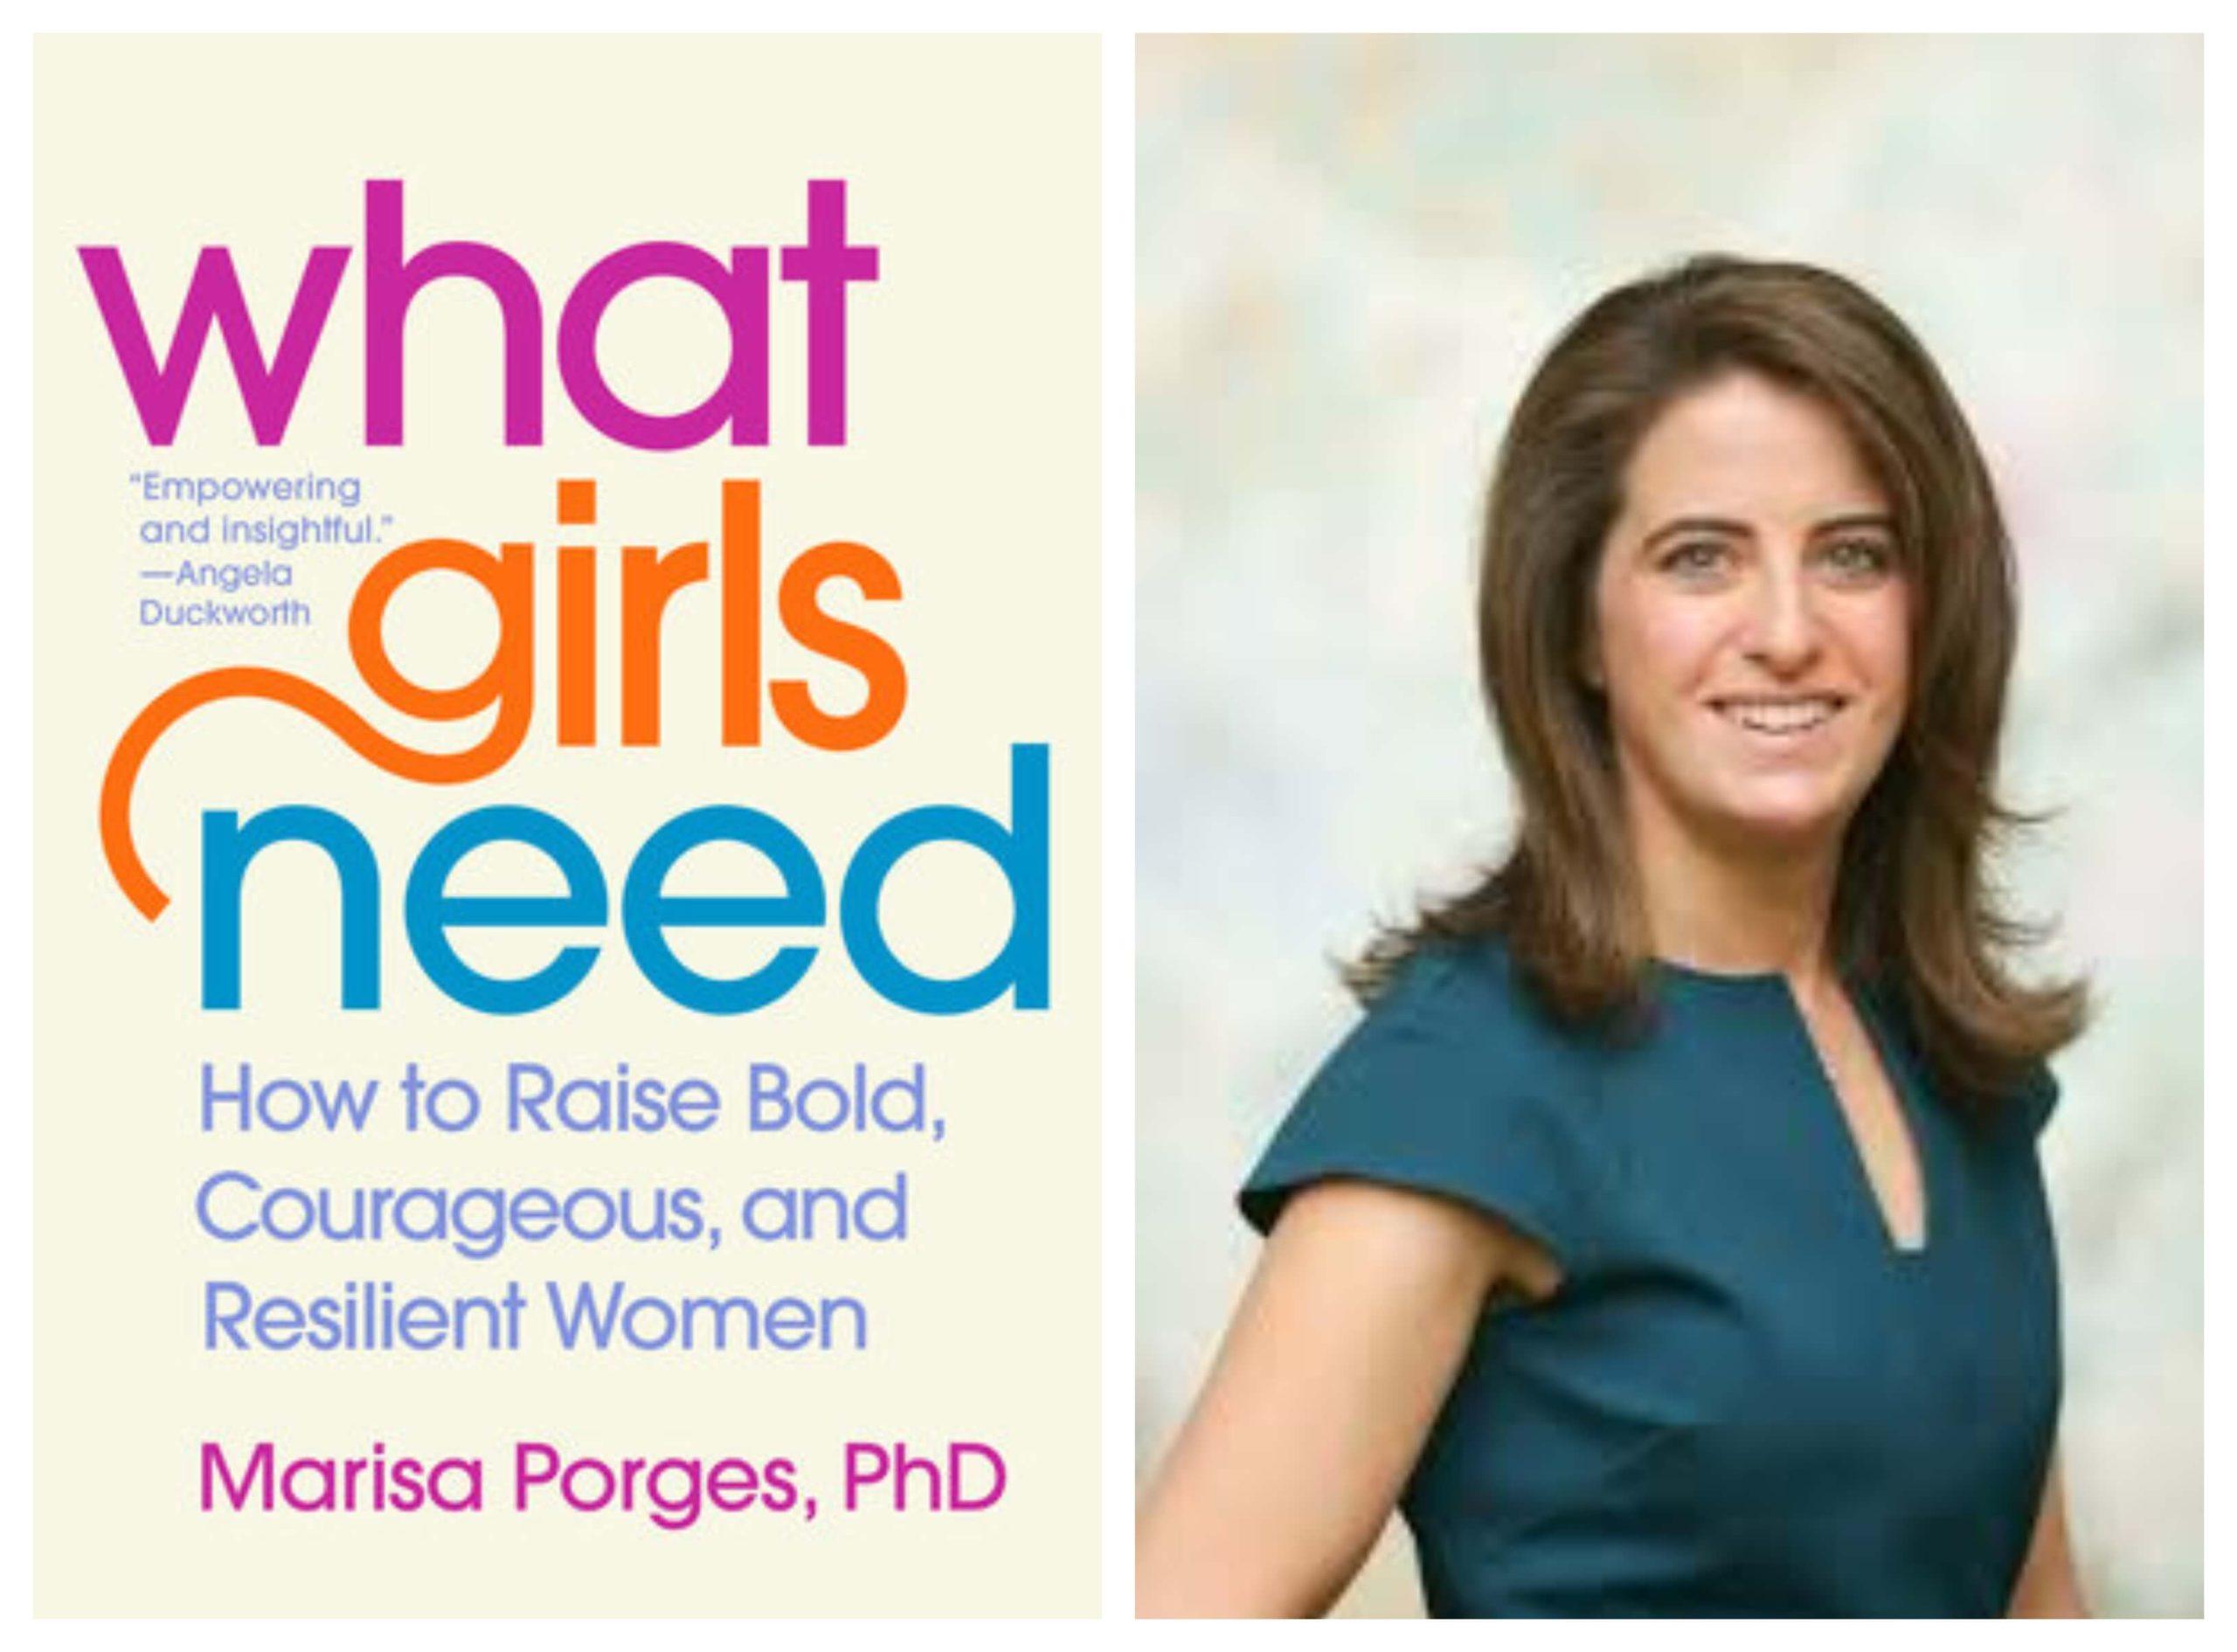 Baldwin School Head of School Helping Usher in Next Generation of Women Leaders with New Book